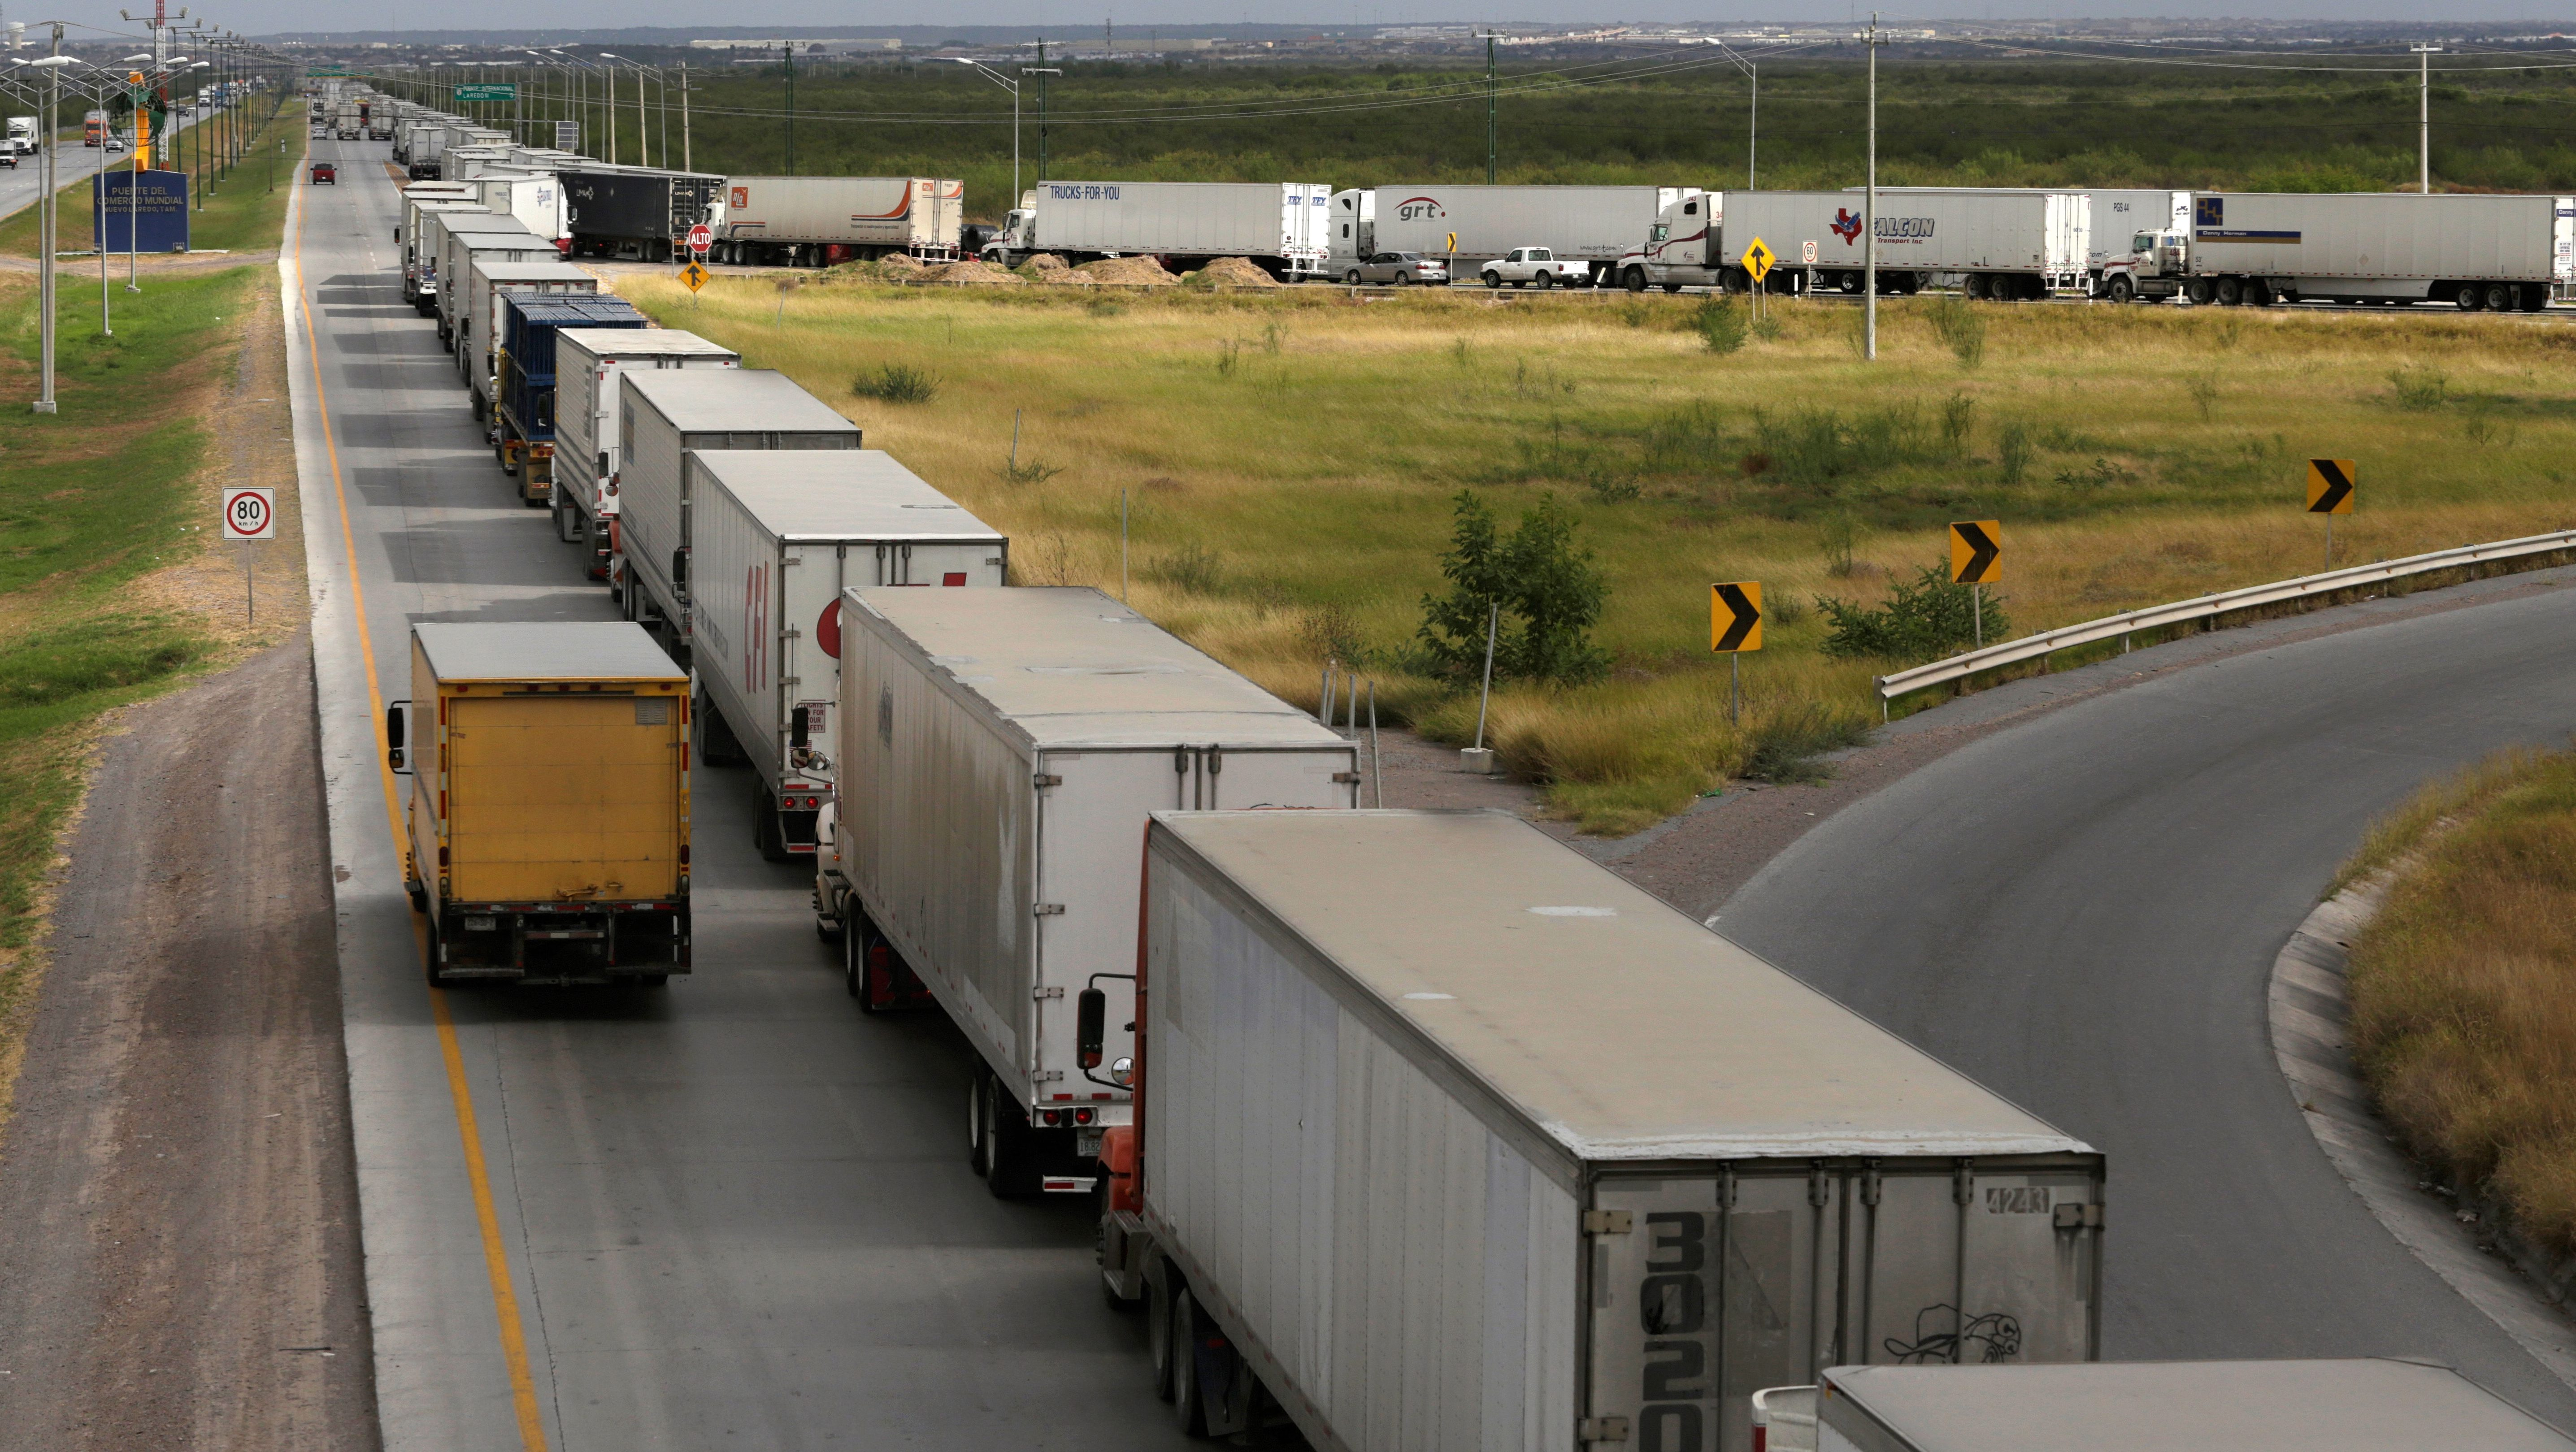 Trucks wait in a long queue for border customs control to cross into U.S. at the World Trade Bridge in Nuevo Laredo, Mexico